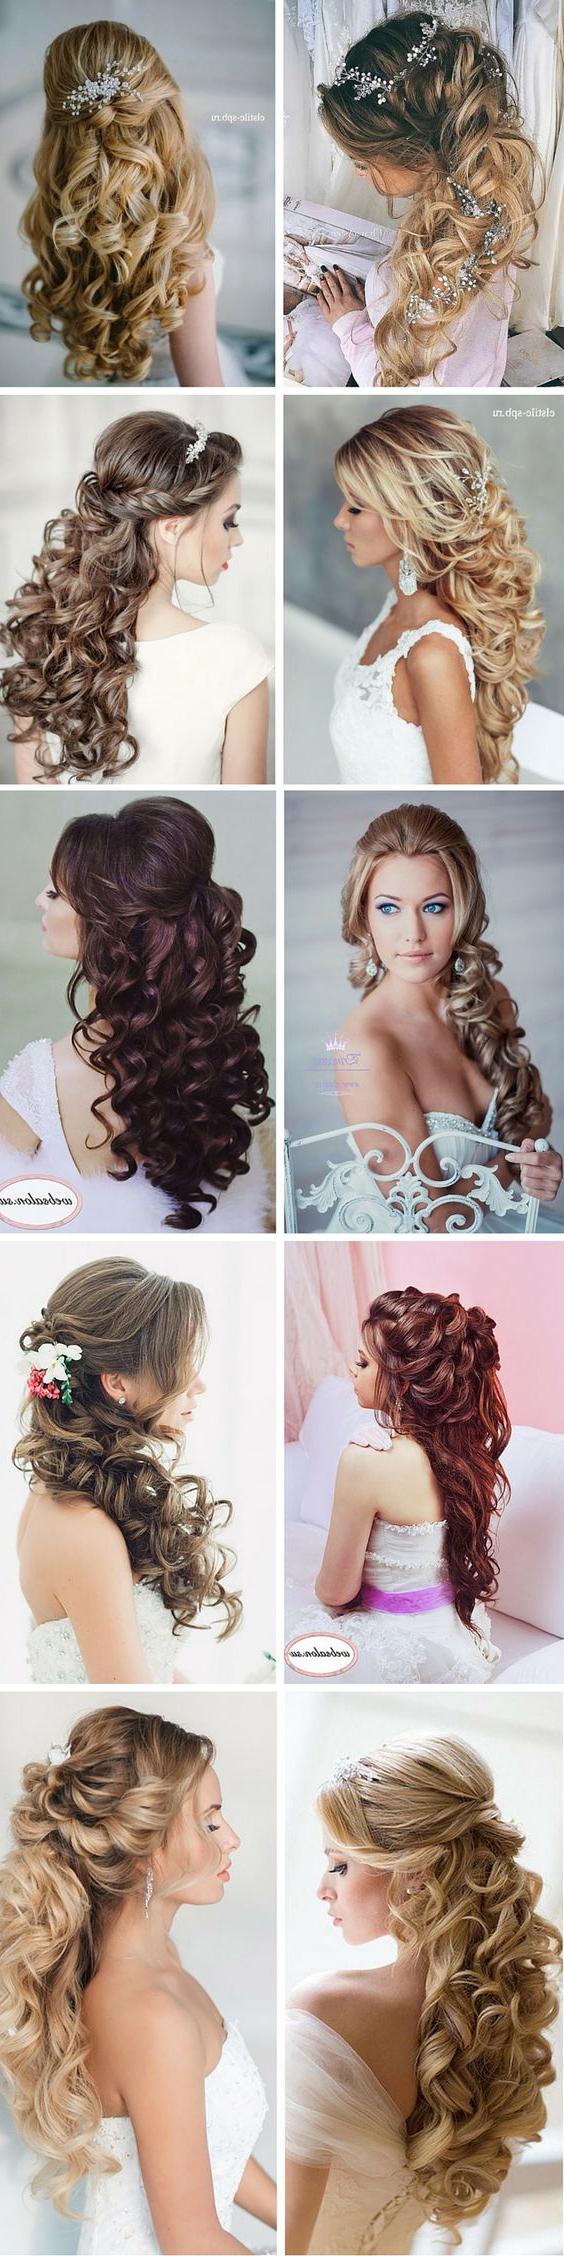 100+ Romantic Long Wedding Hairstyles 2019